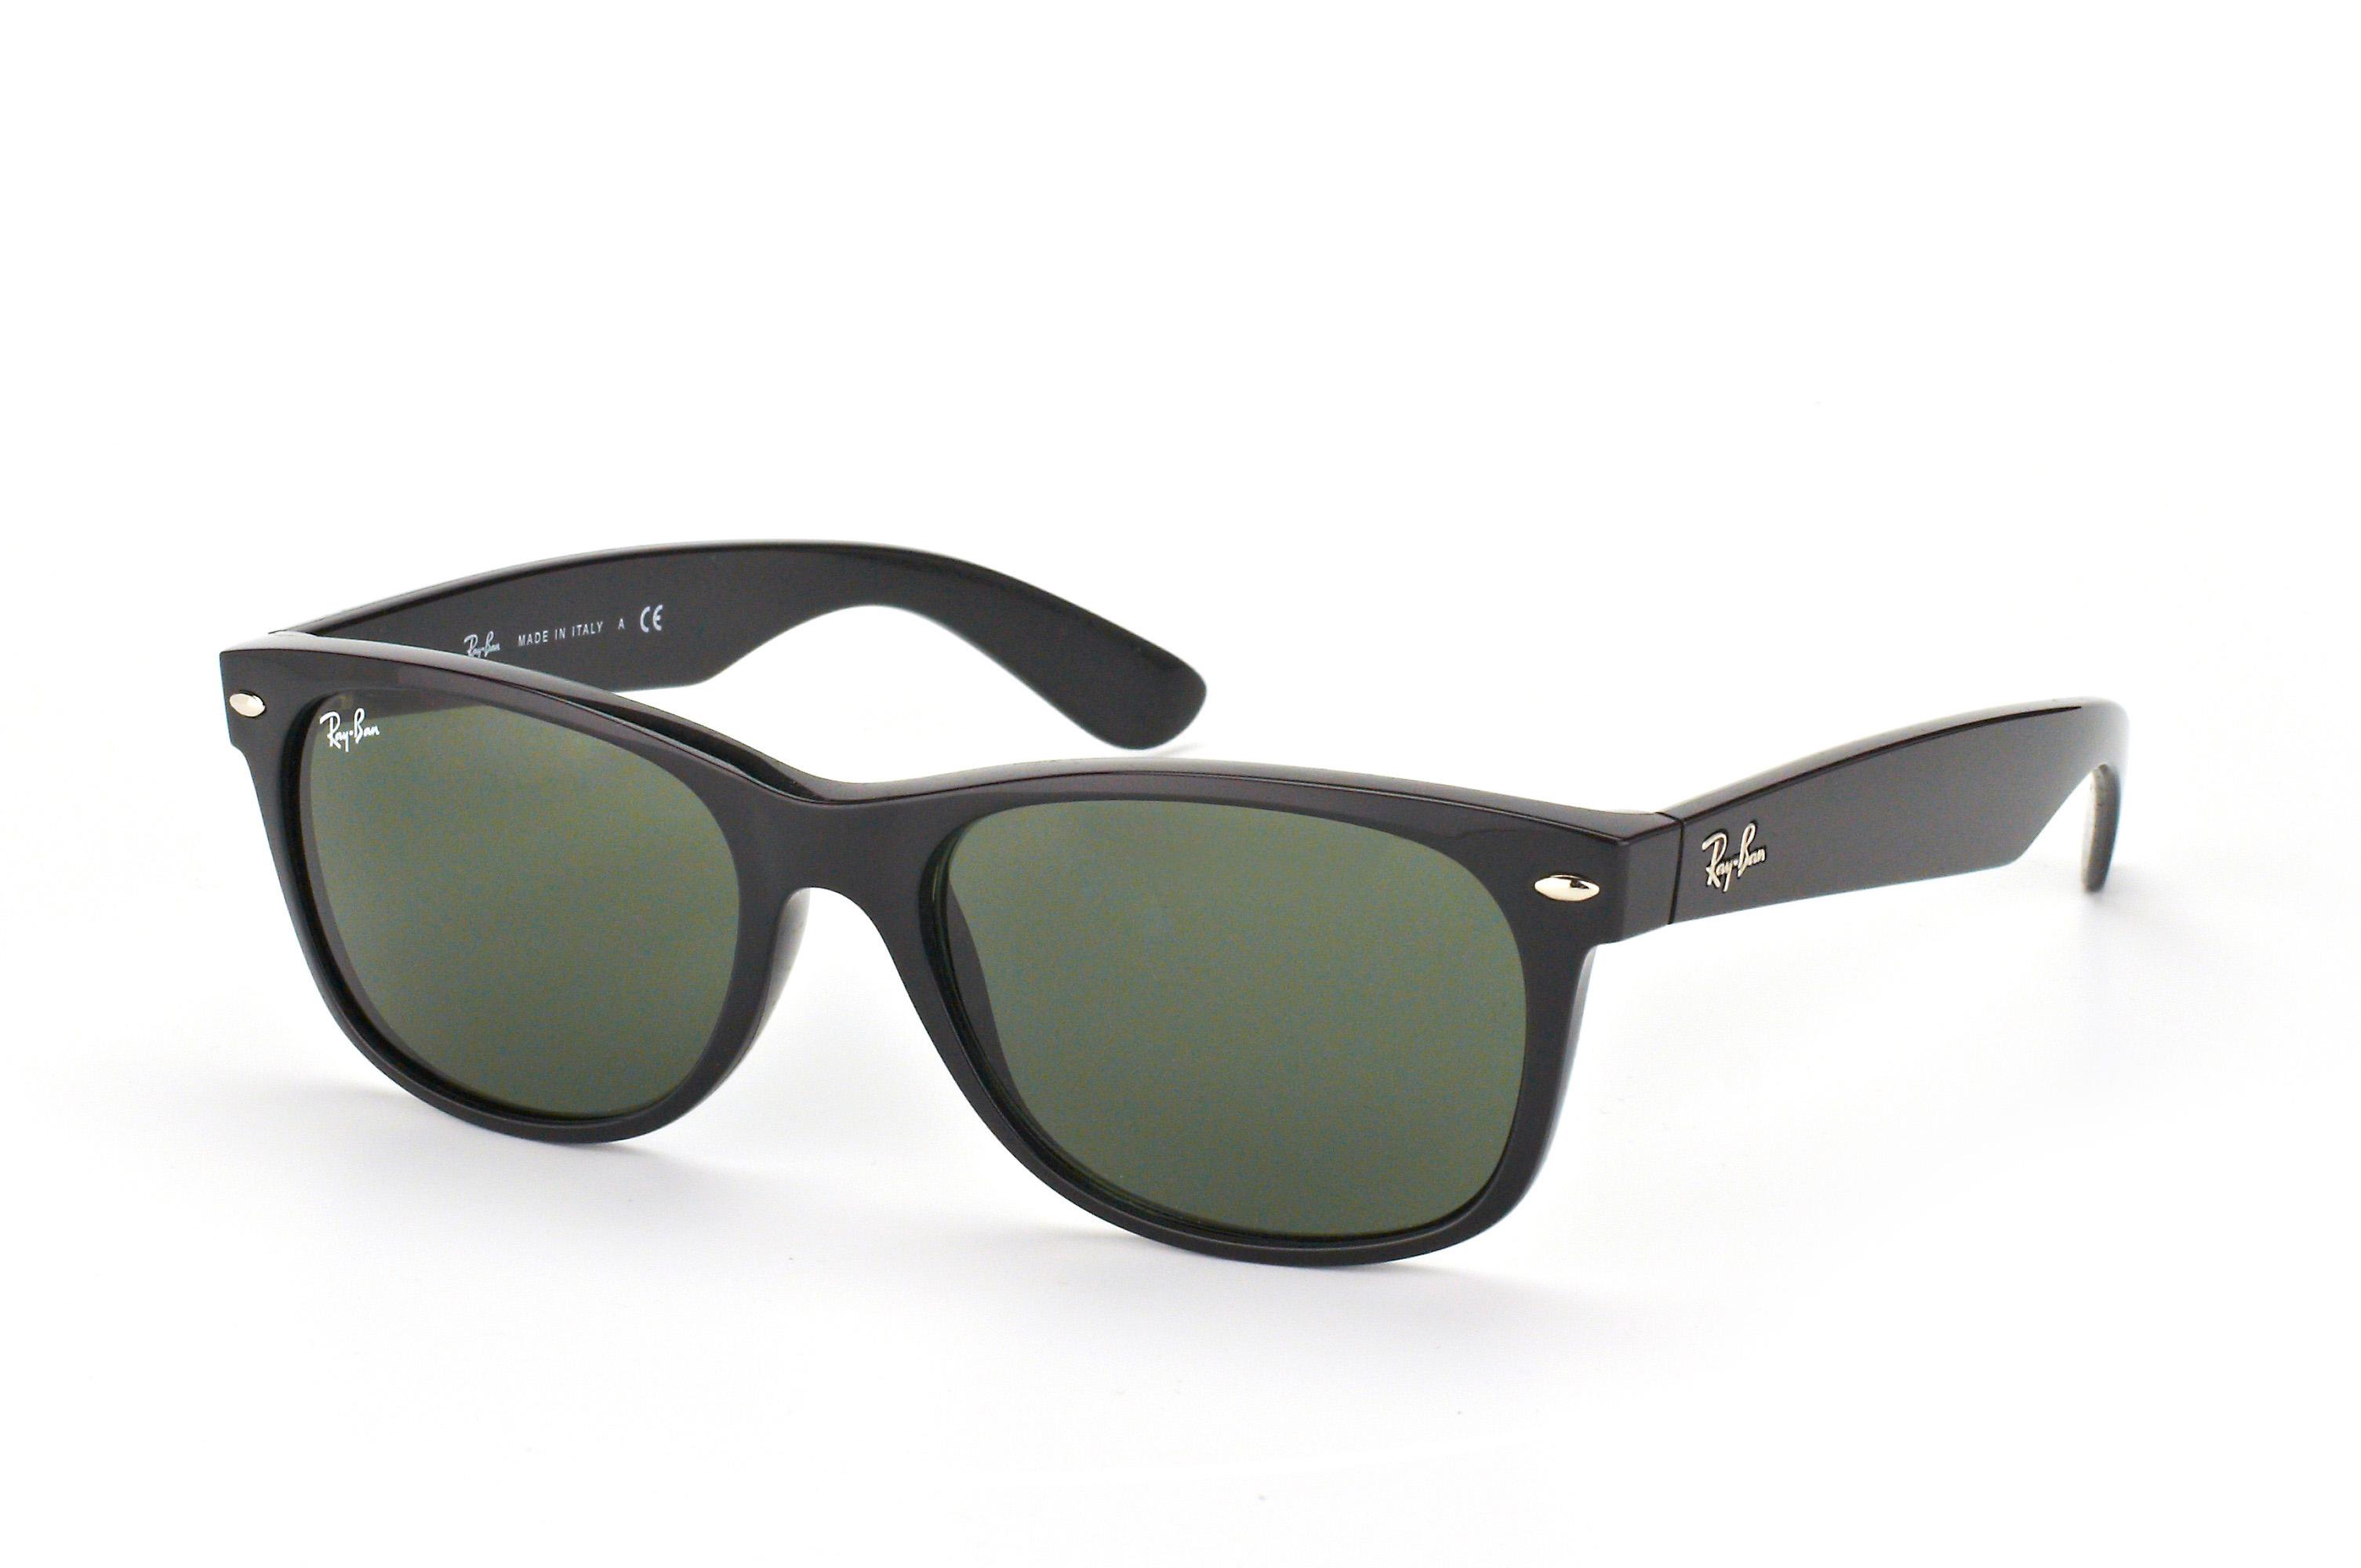 Ray Ban New Wayfarer RB 20 20L l Sonnenbrille kaufen